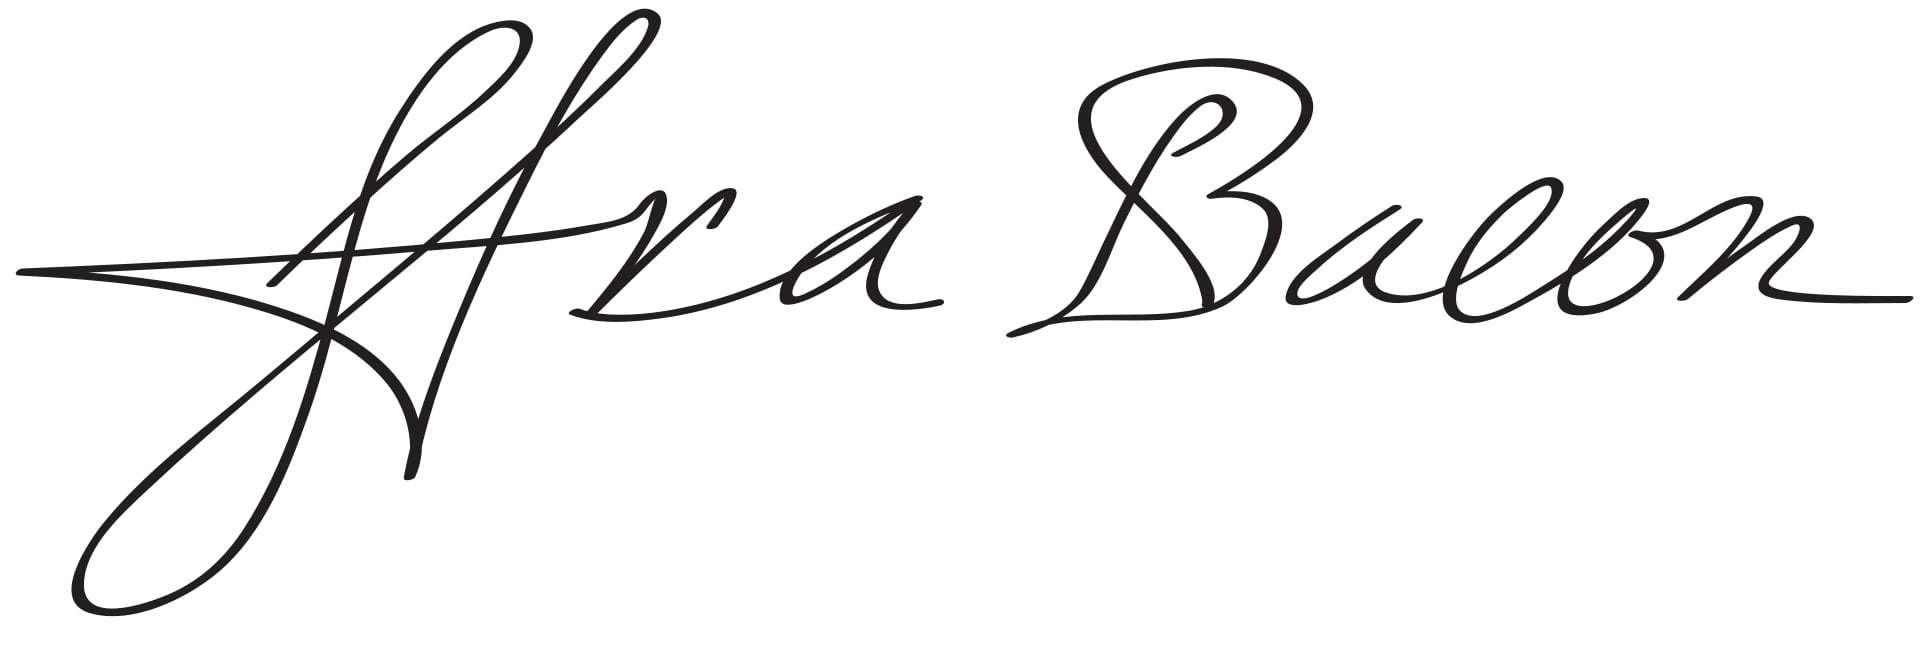 Francis Bacon Signature